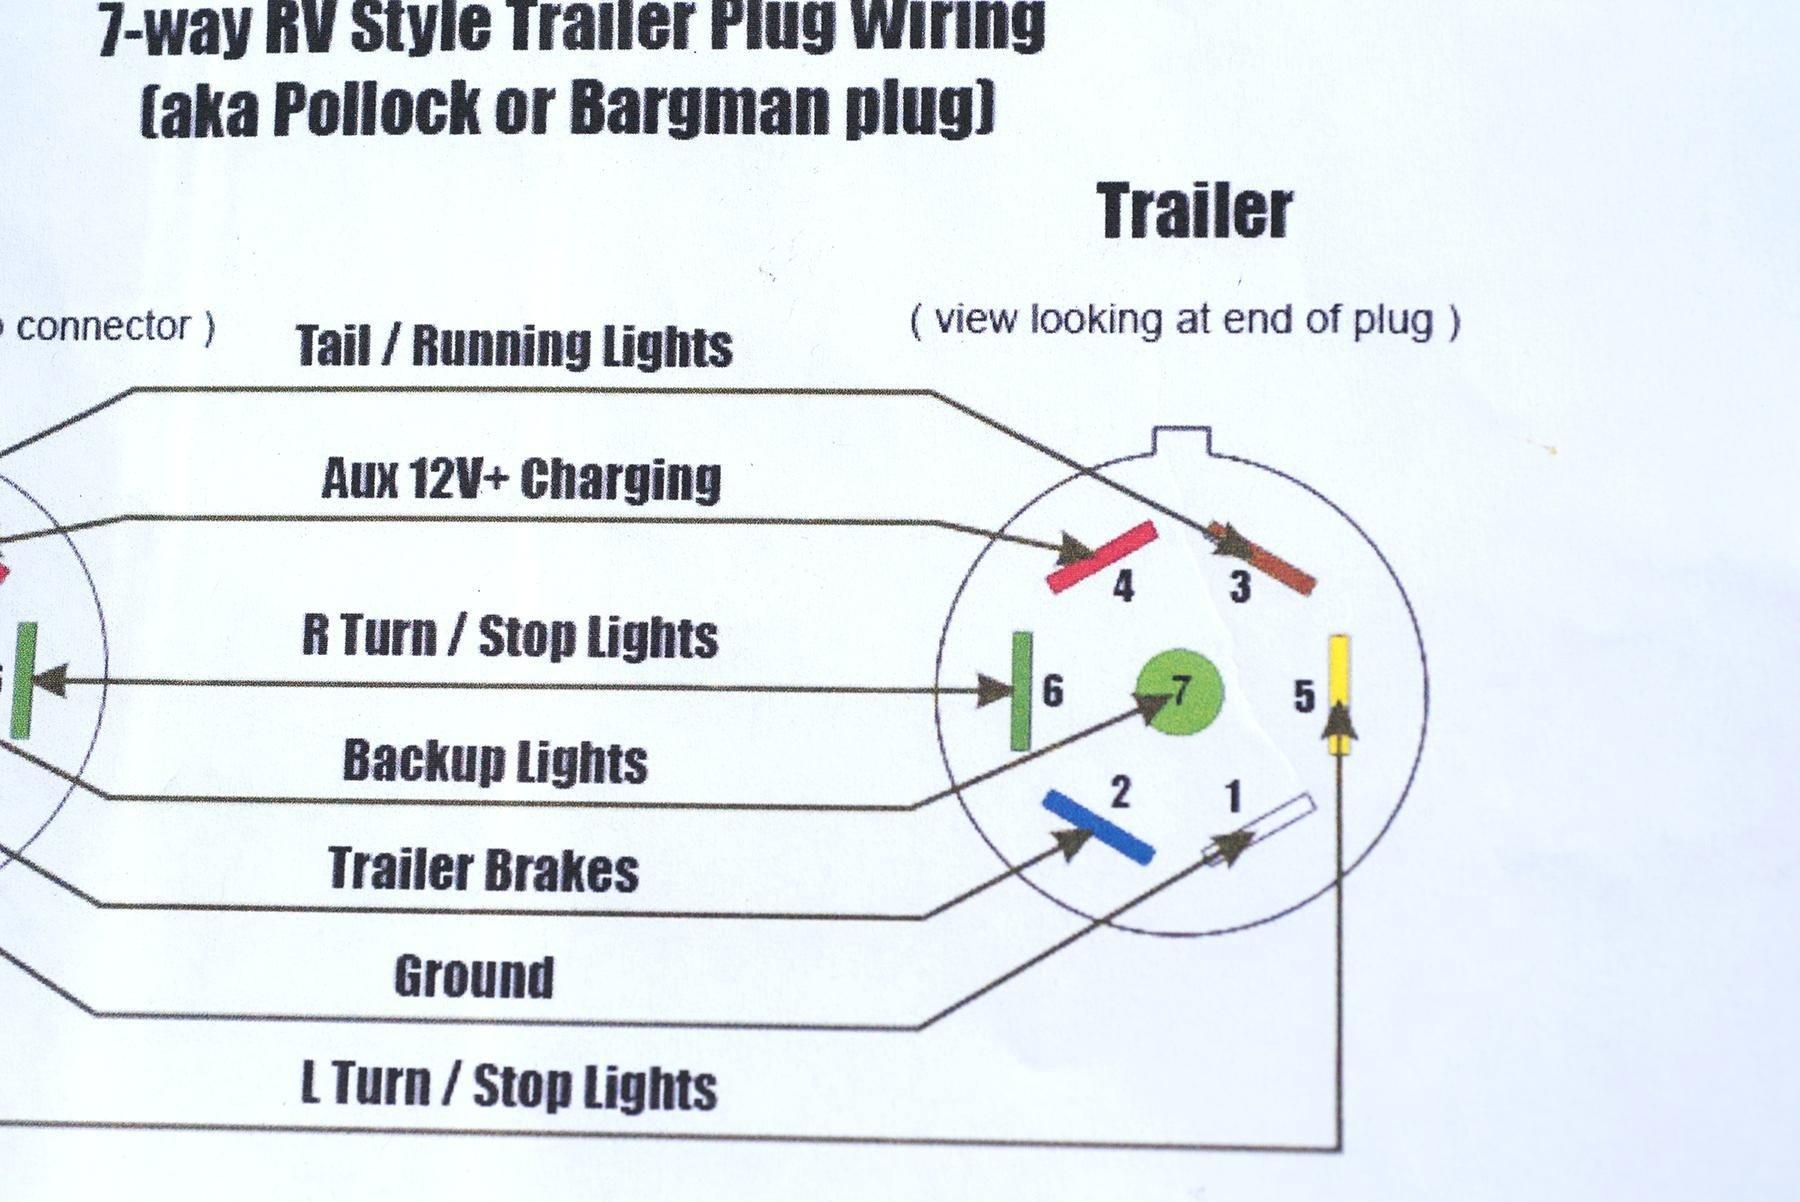 7 Wire Trailer Plug Diagram Rv Trailer Plug Wiring Diagram Download Of 7 Wire Trailer Plug Diagram